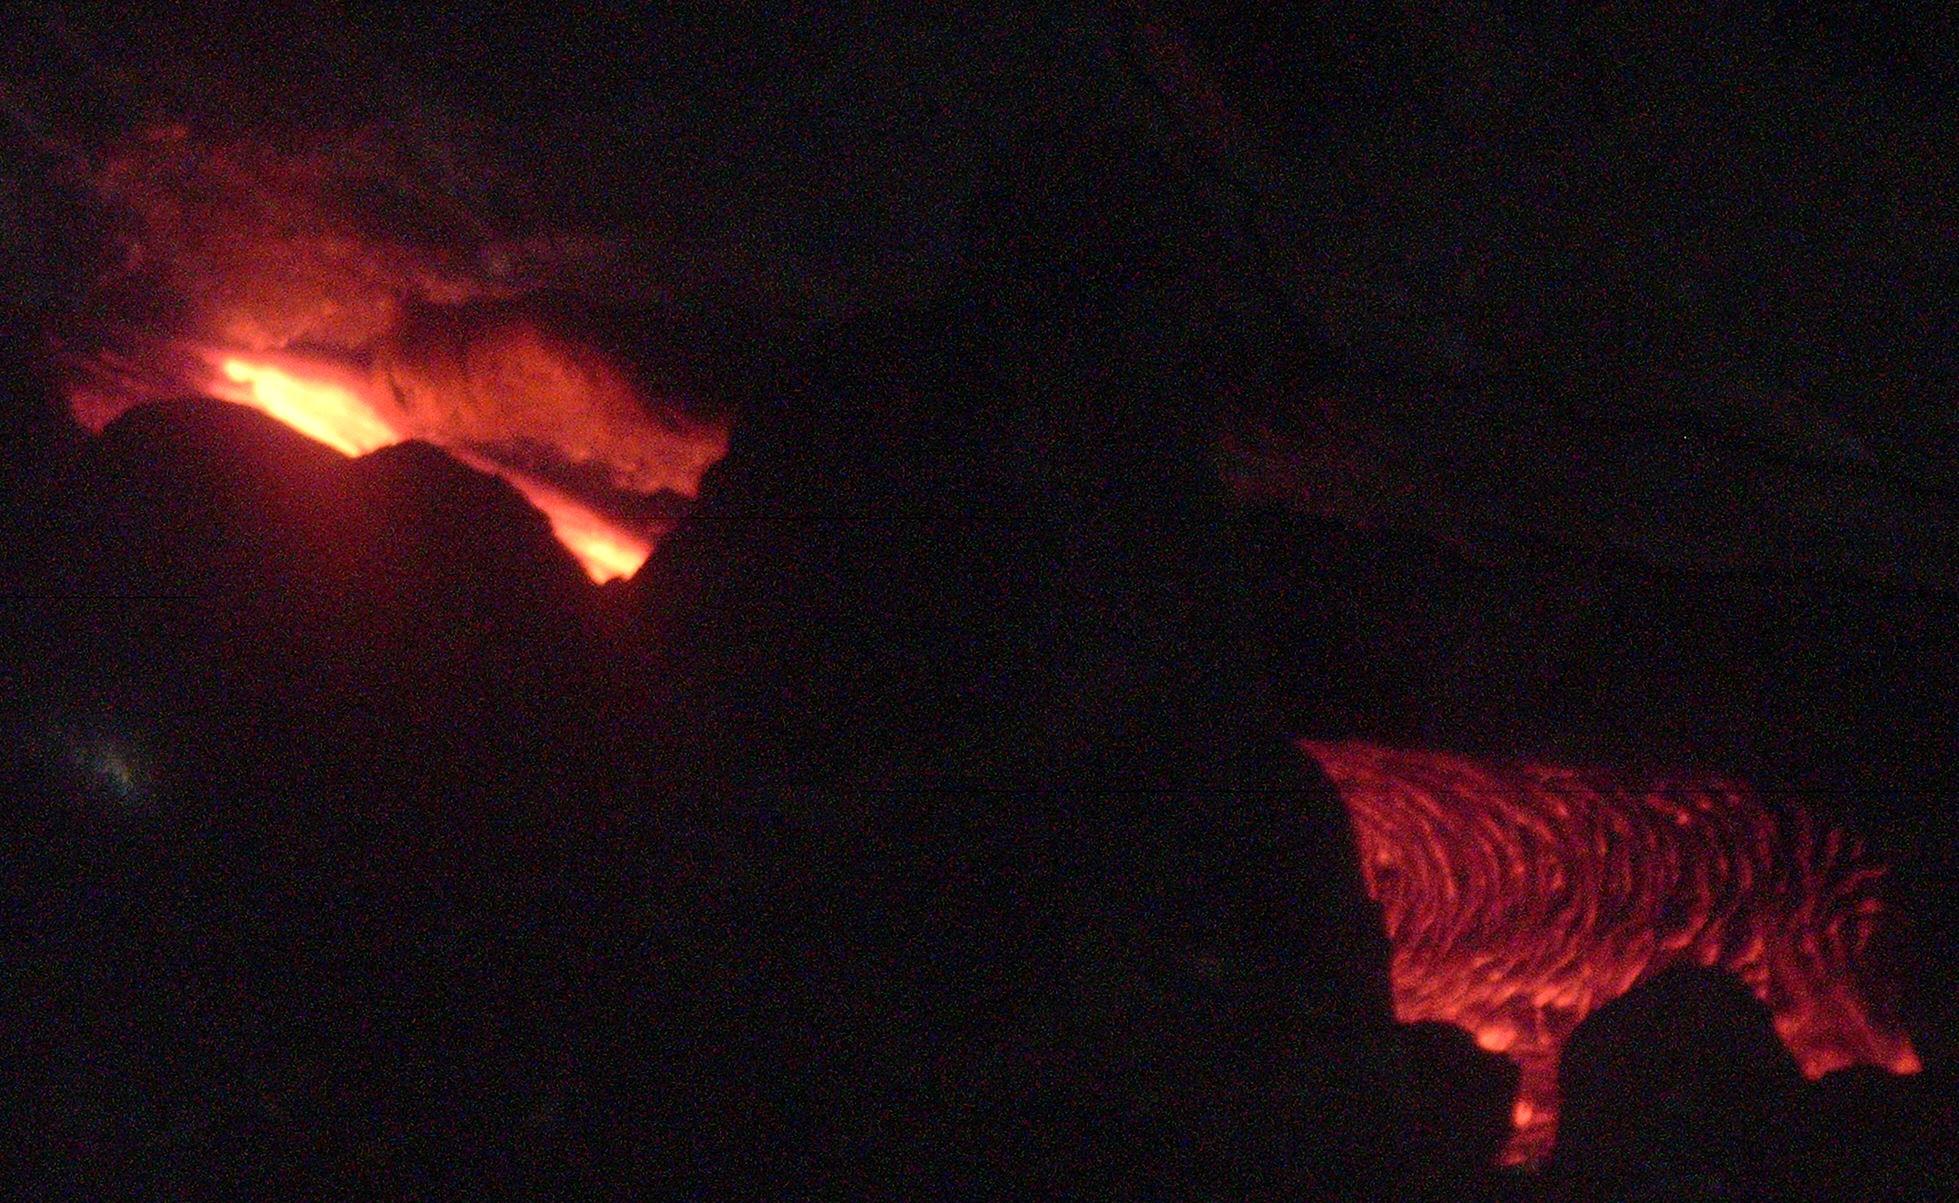 night lava 3.JPG